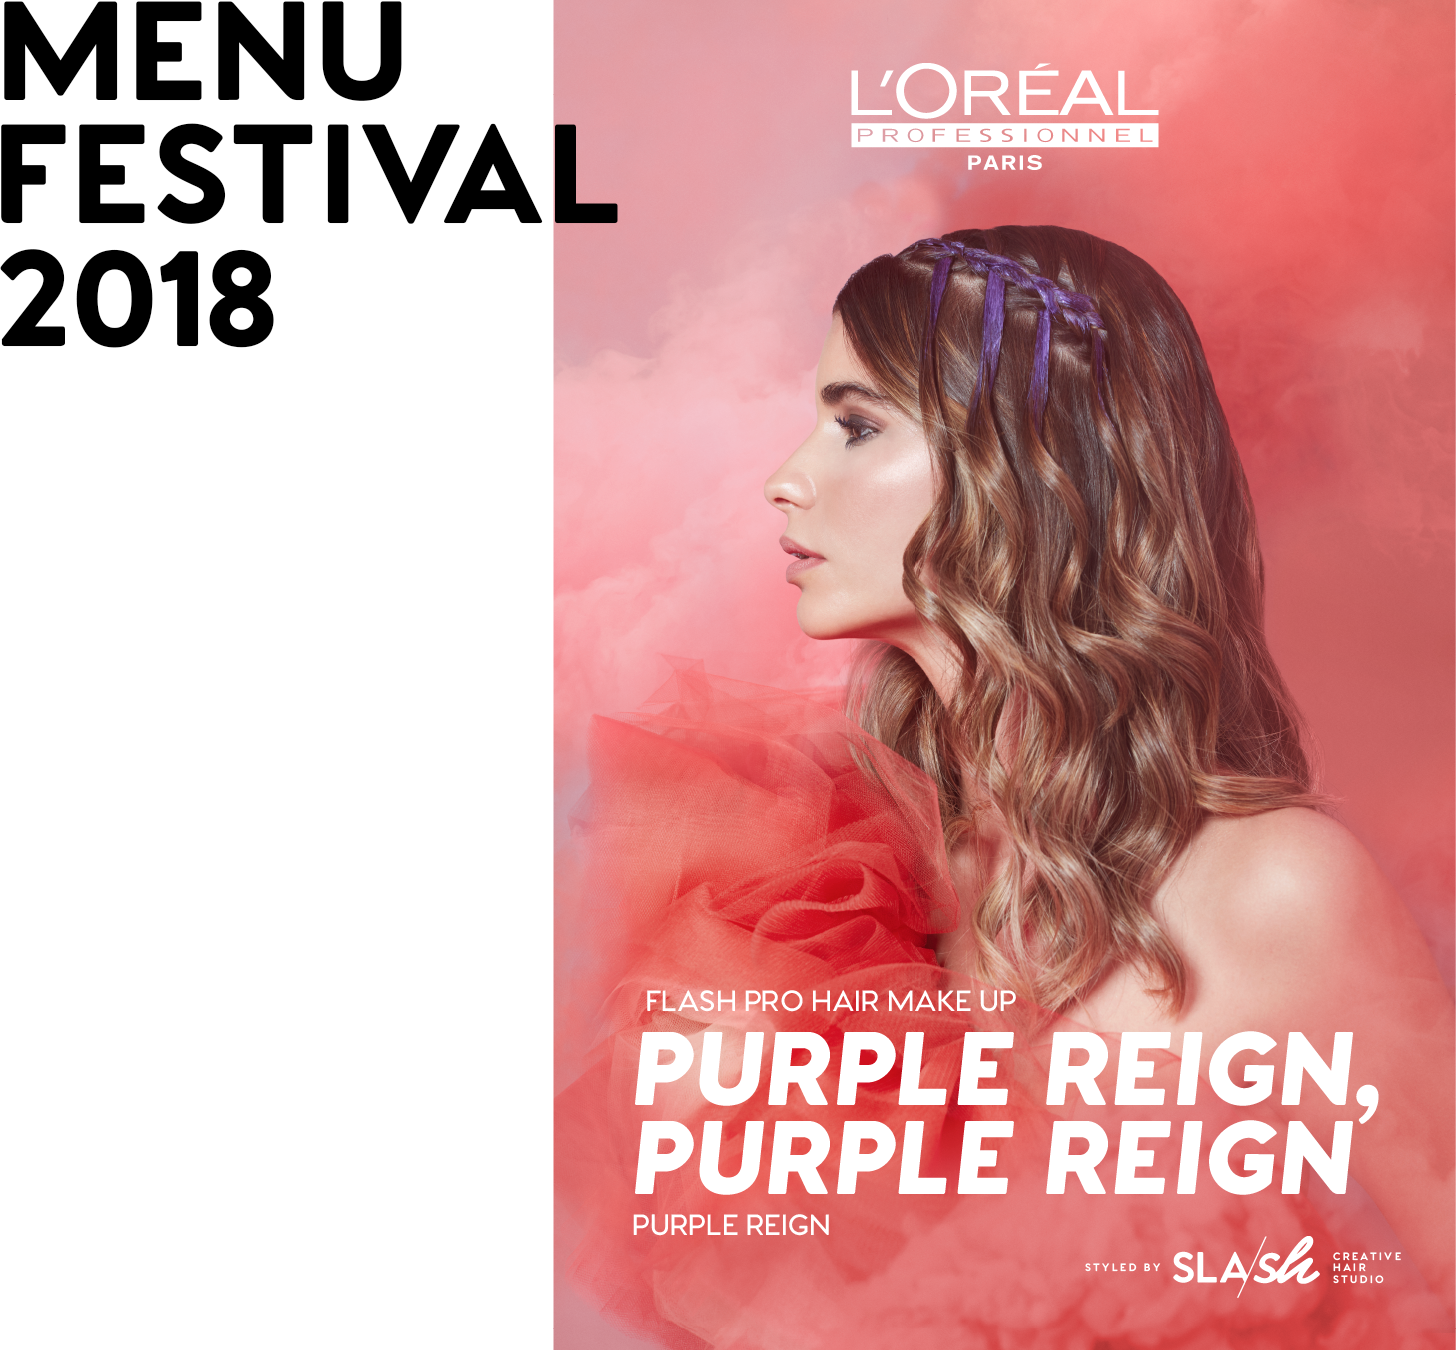 menu-festival-2018_4_purple_reign_purple_reign